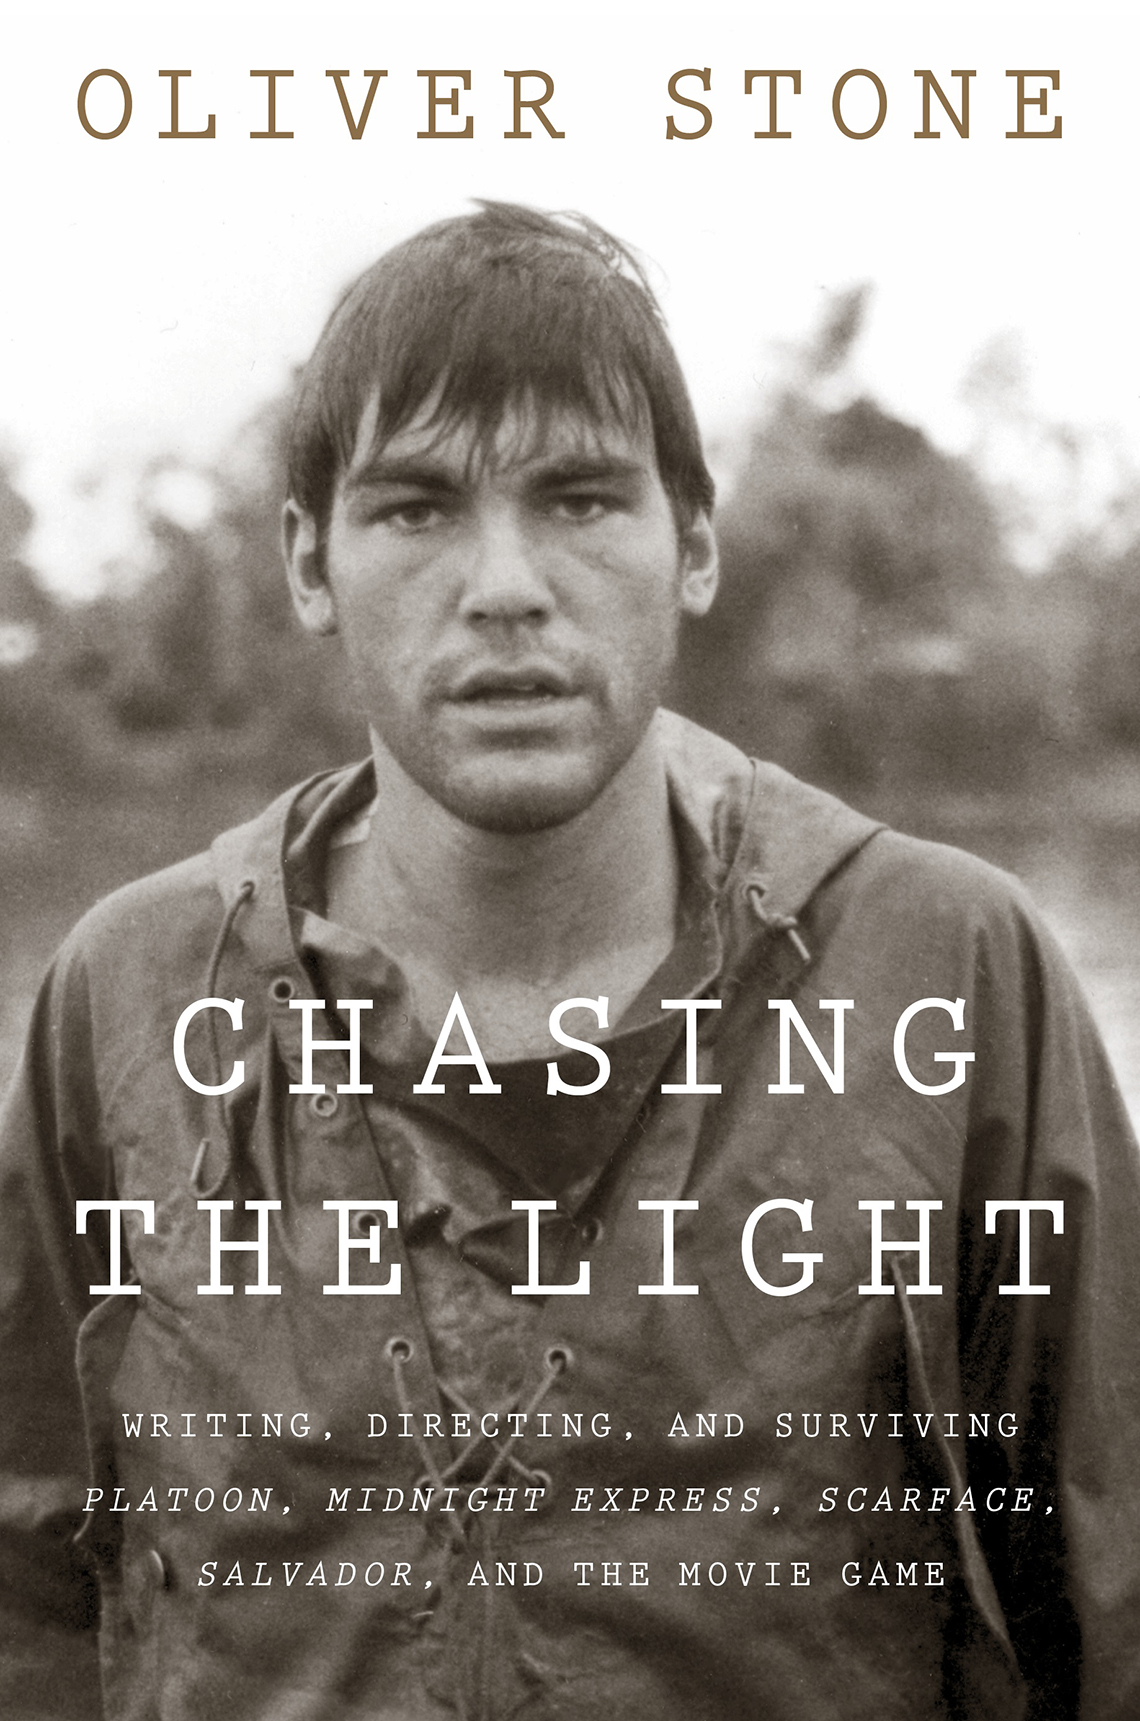 Portada de la autobiografía de Oliver Stone 'Chasing the Light'